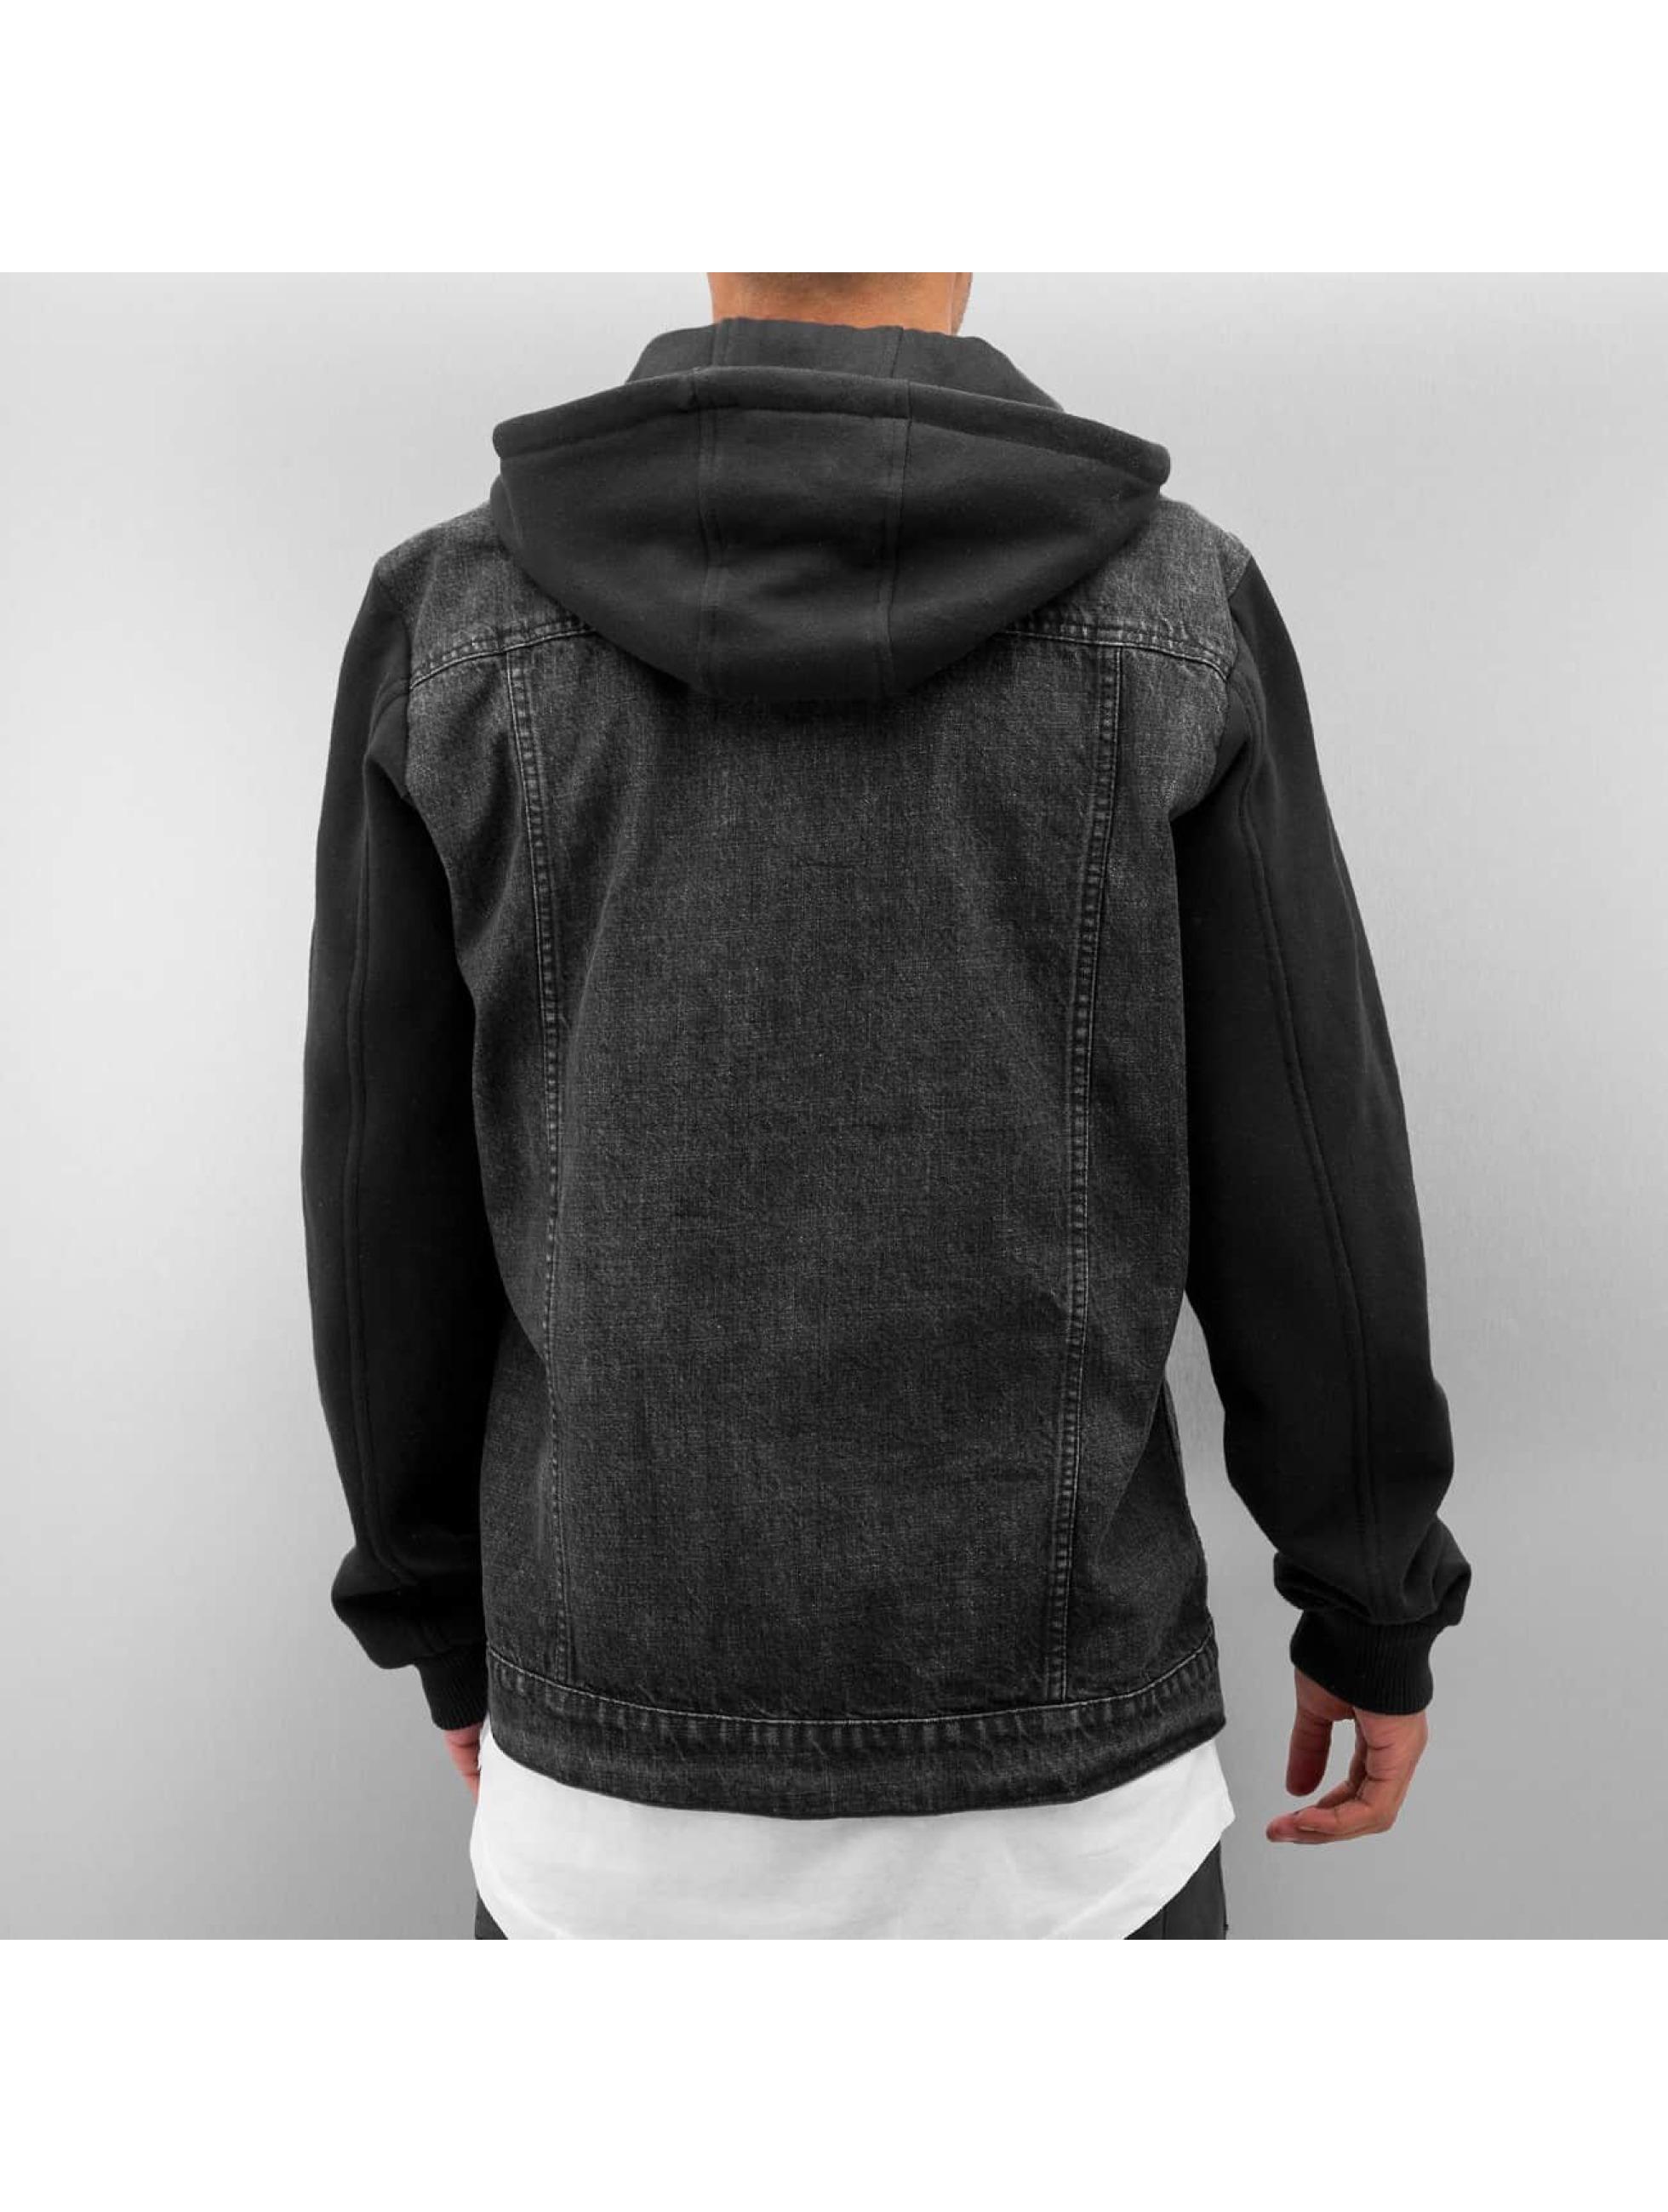 Urban Classics Lightweight Jacket Hooded Denim Fleece black